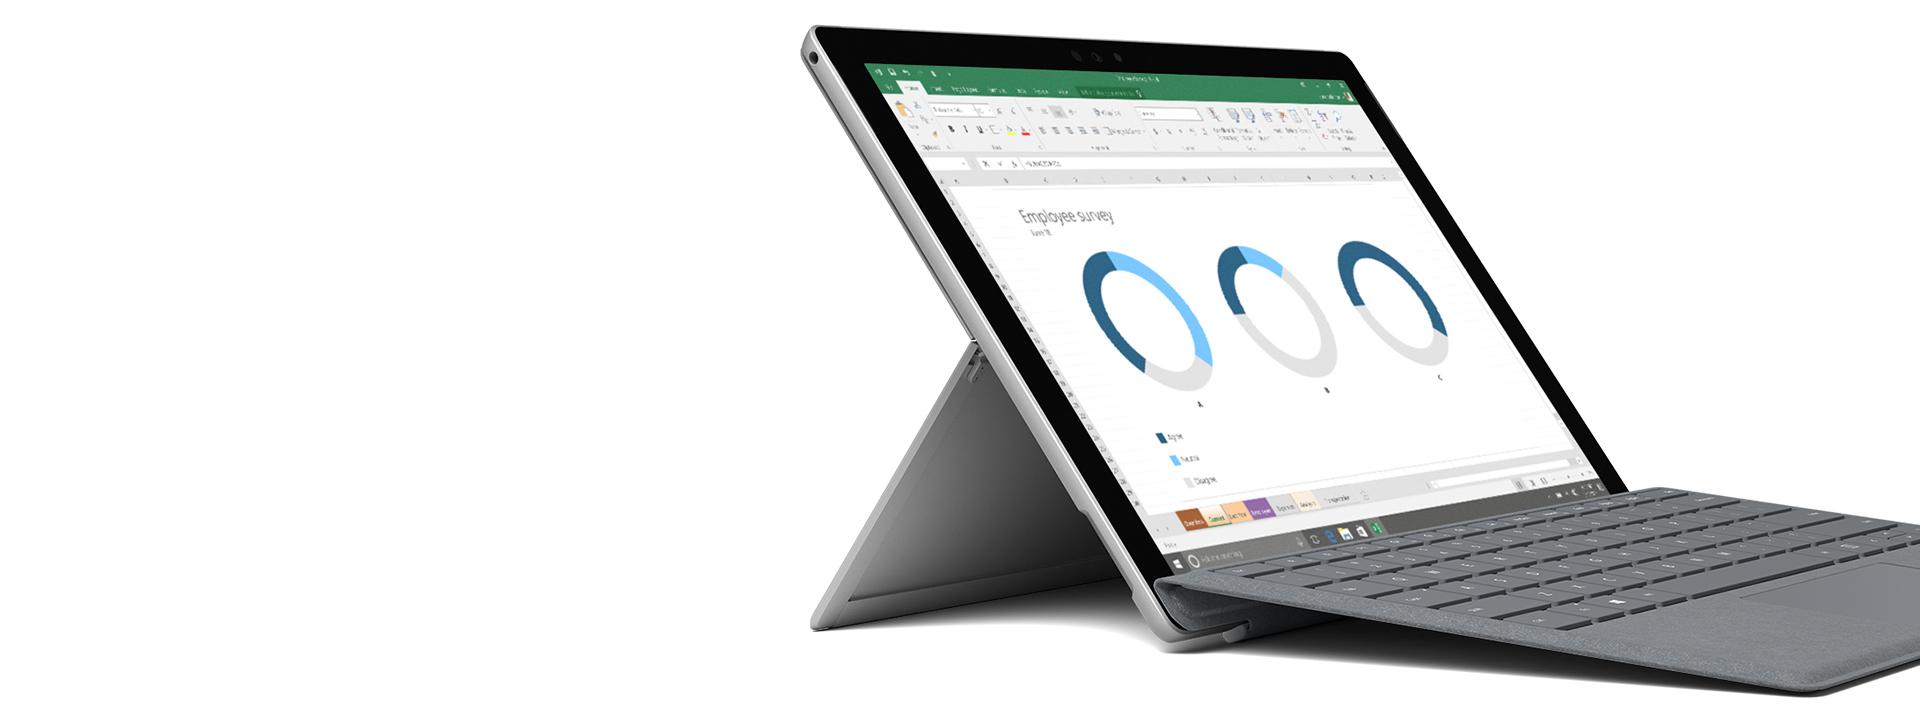 Surface-apparaat getoond met Windows/Office-screenshot.